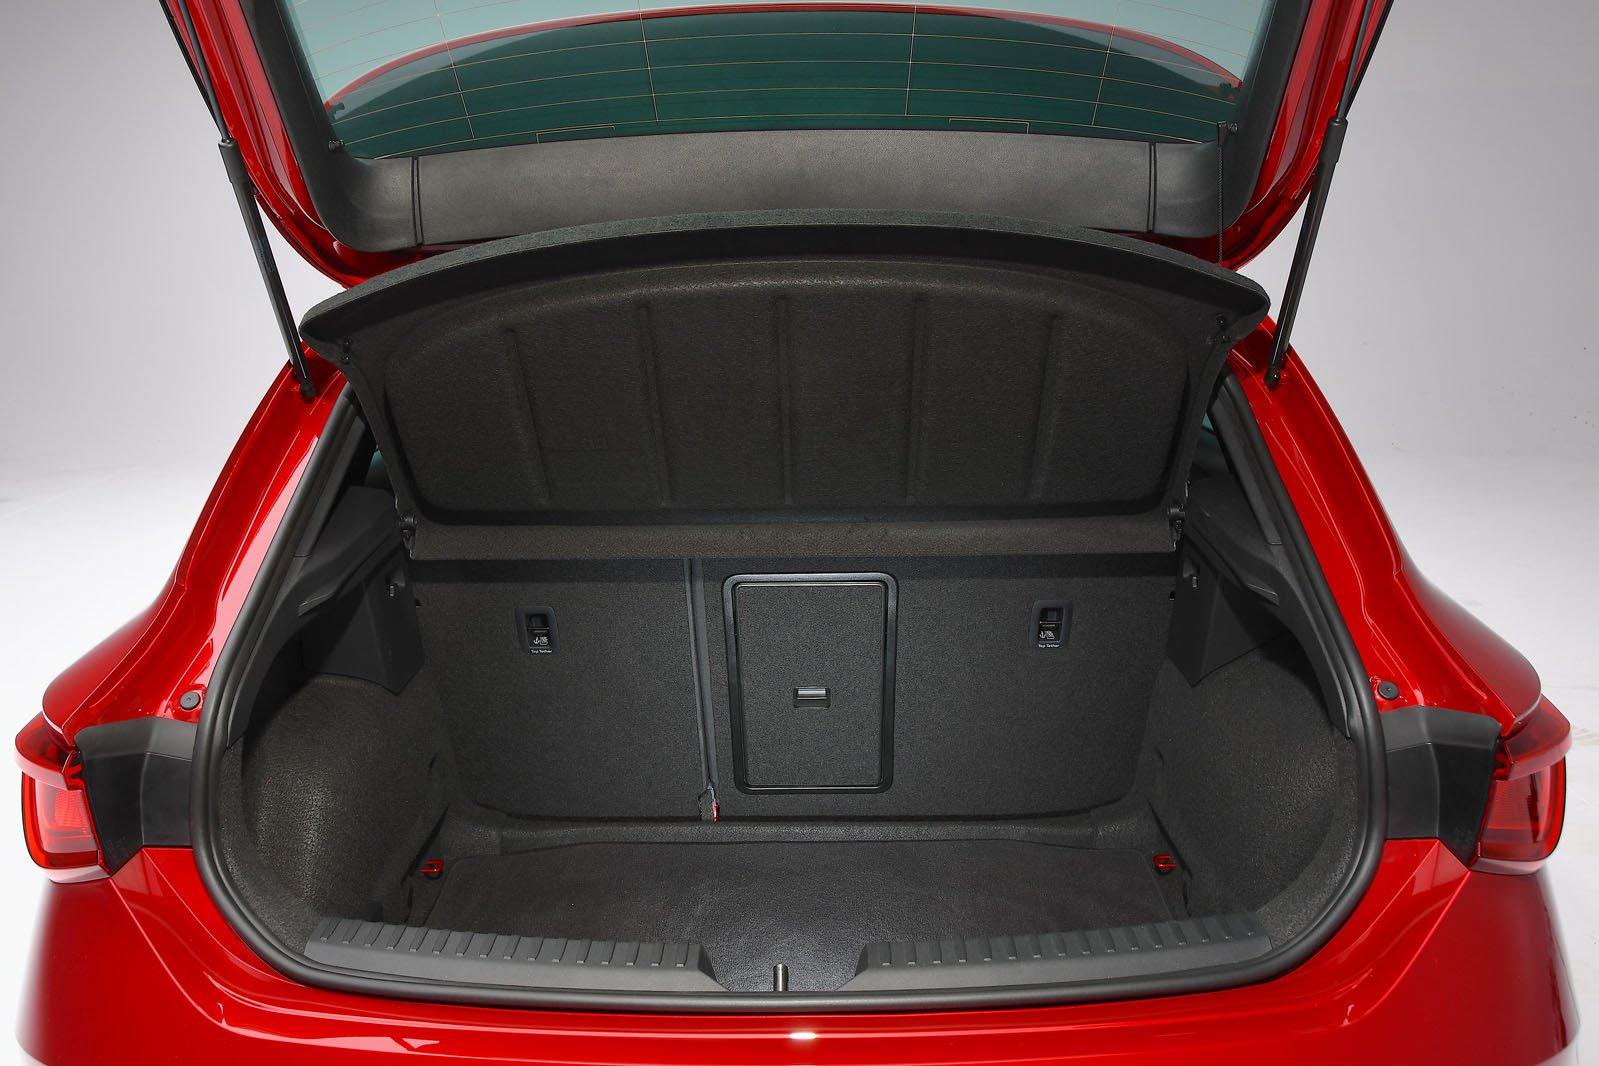 2020 Seat Leon boot